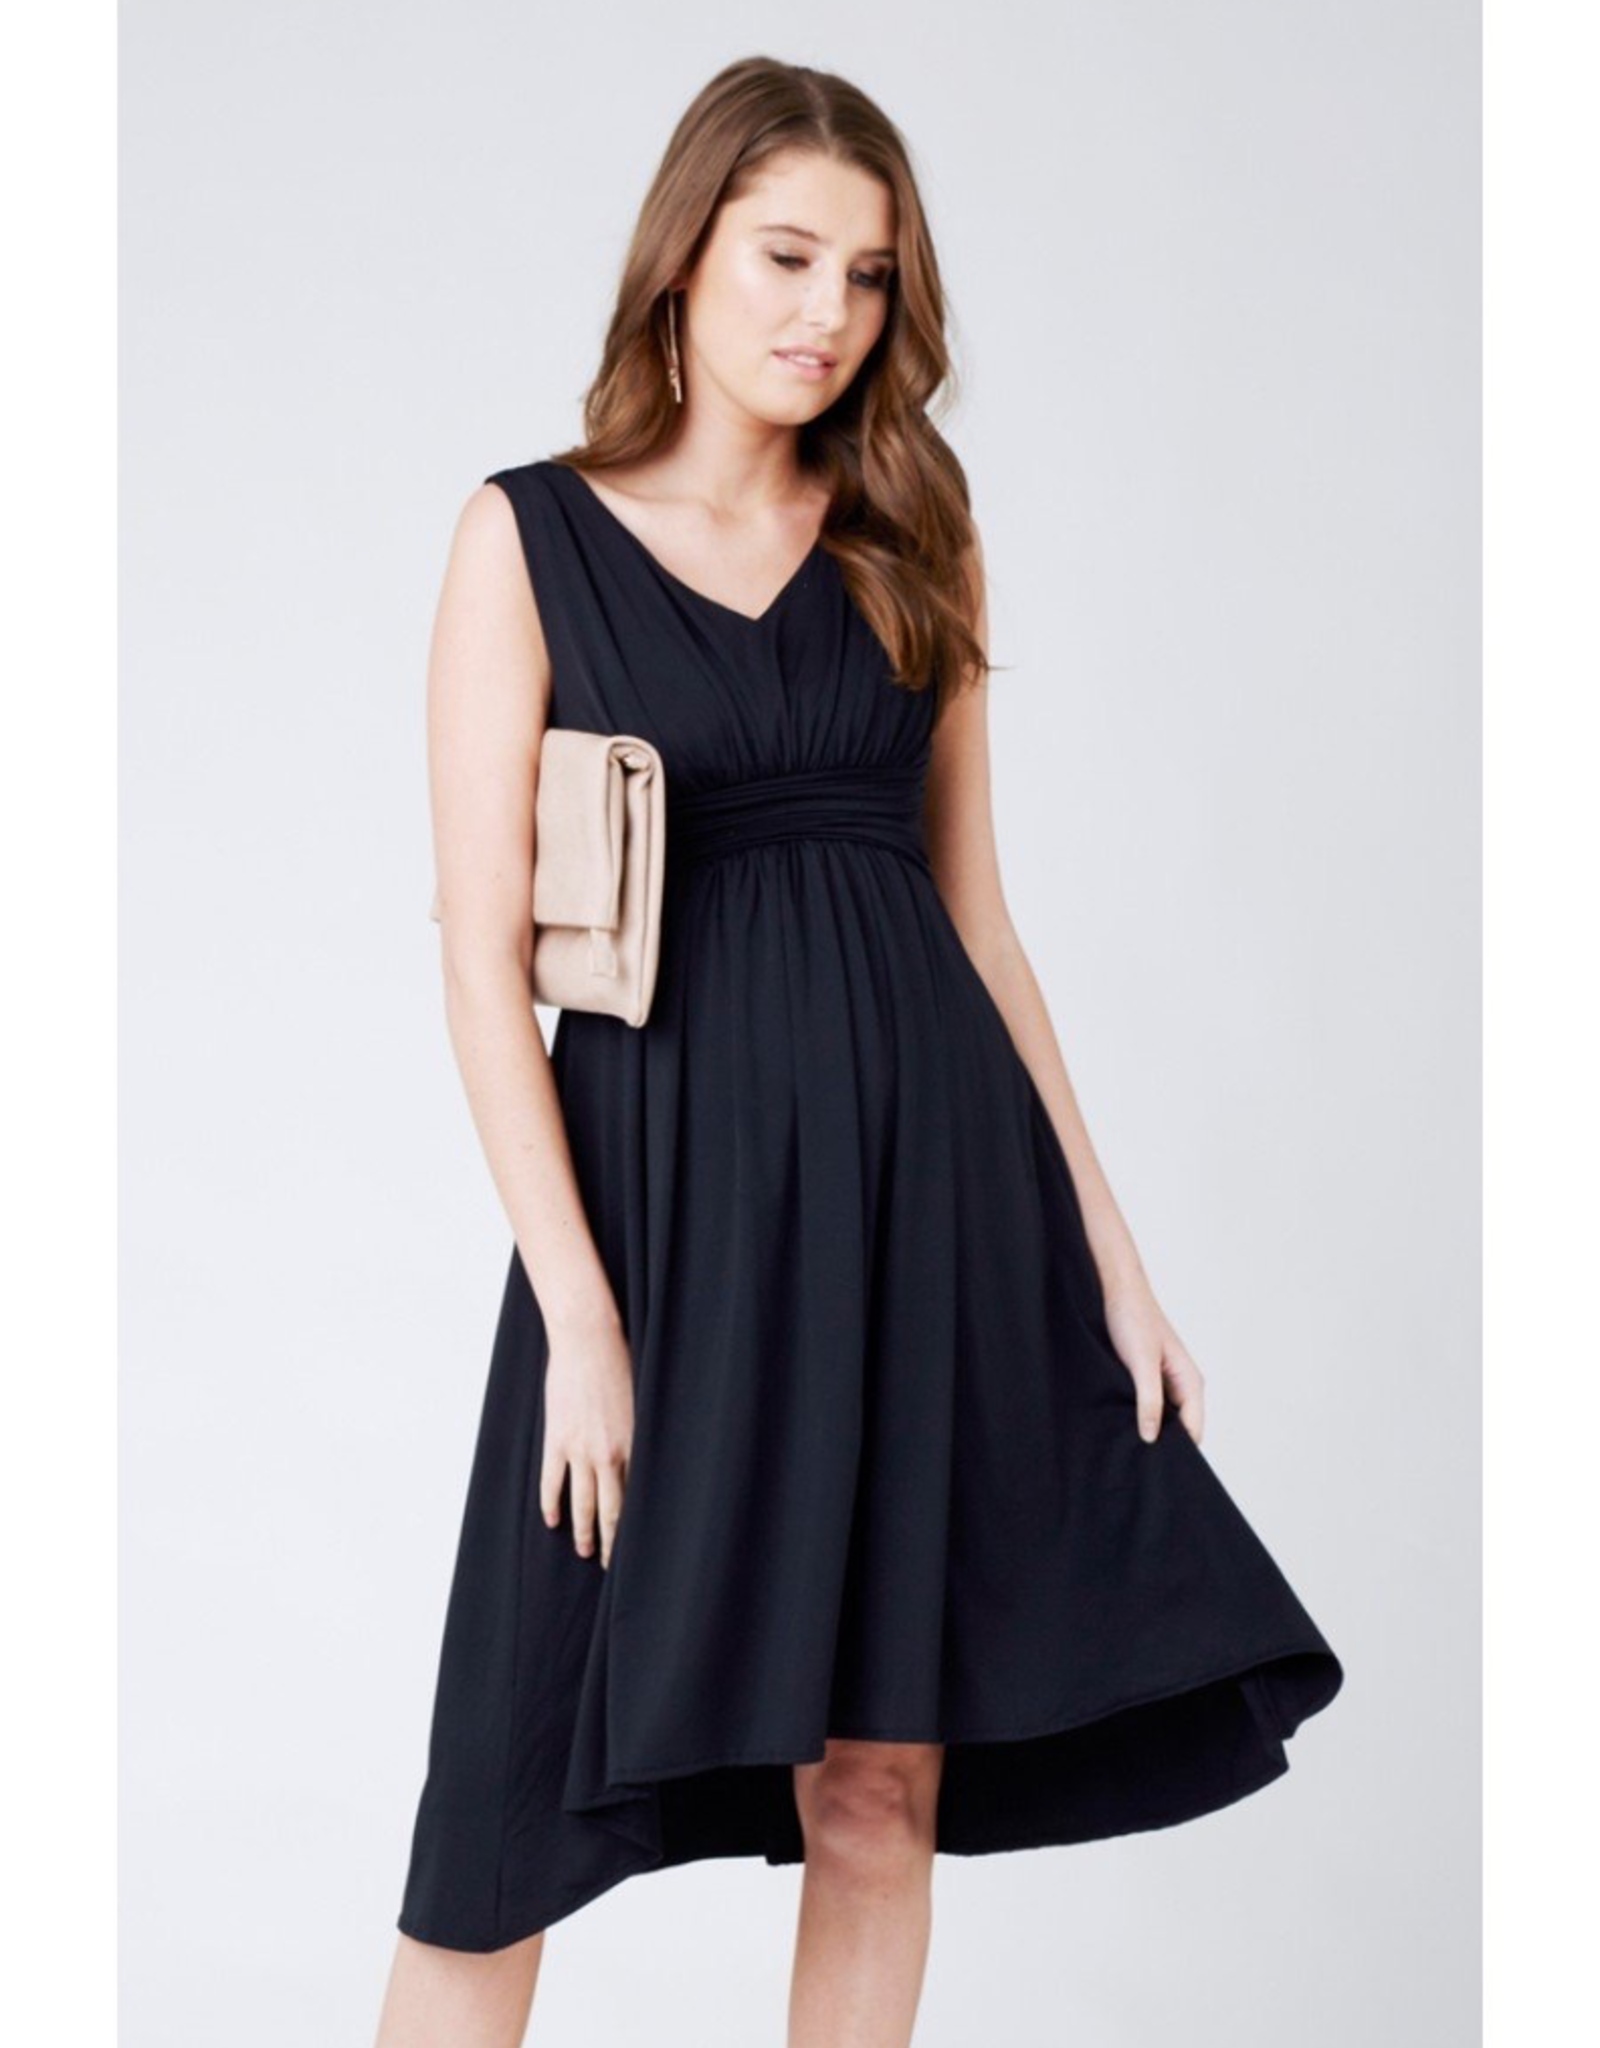 Ripe Maternity Rachael Party Dress